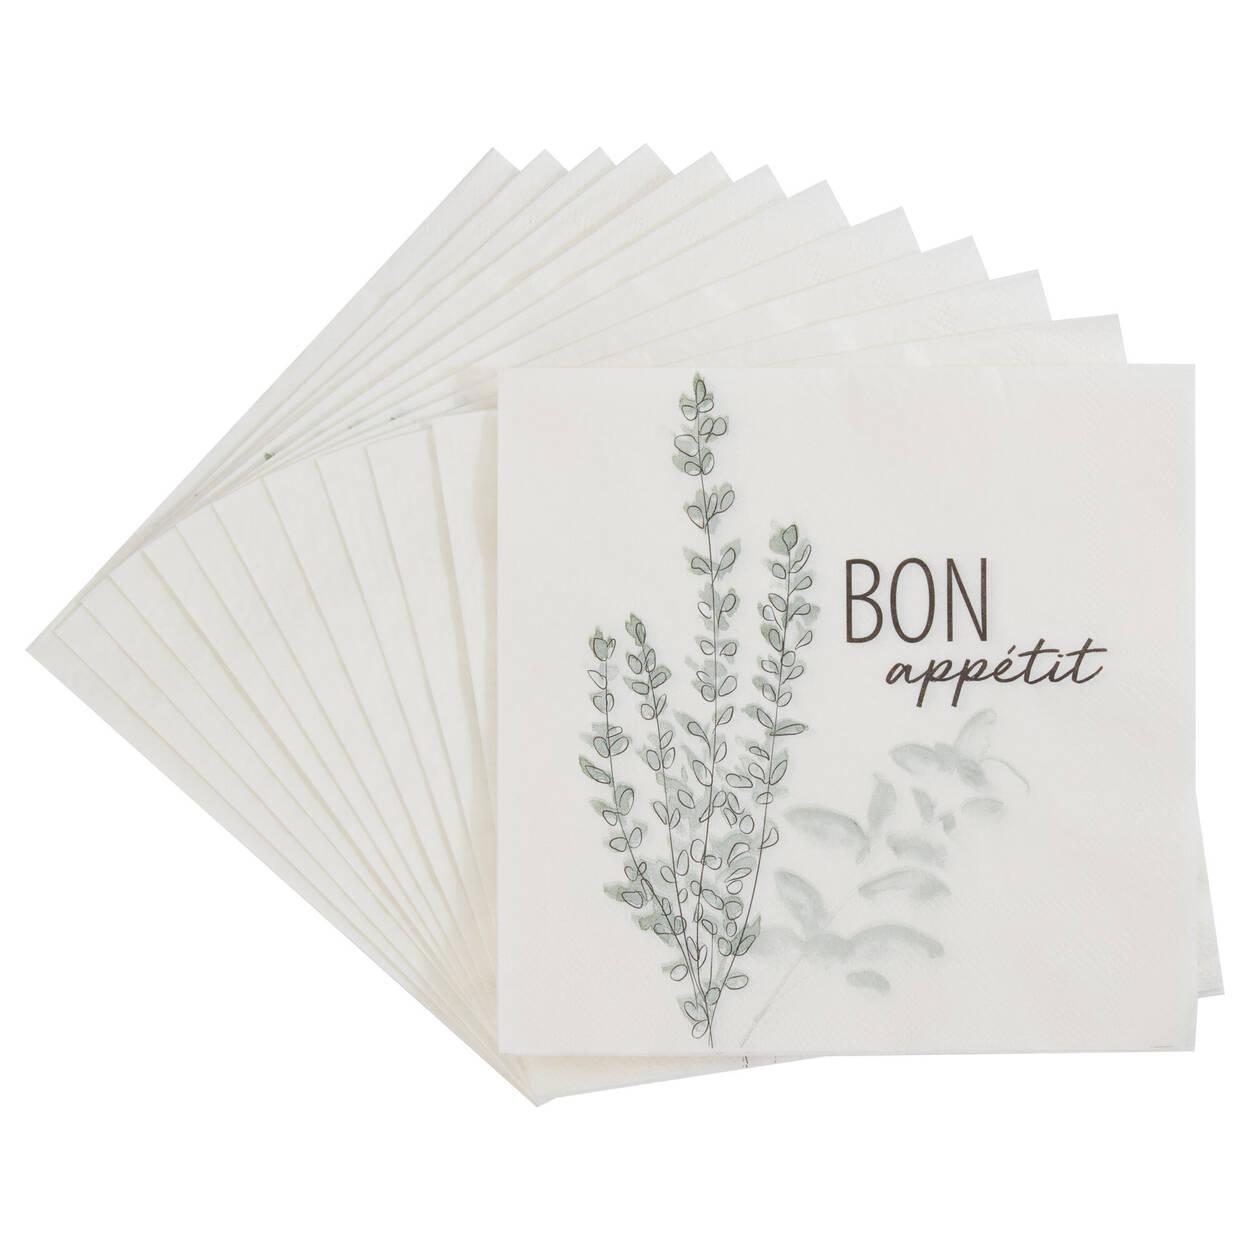 Pack of 20 Bon Appétit Paper Napkins